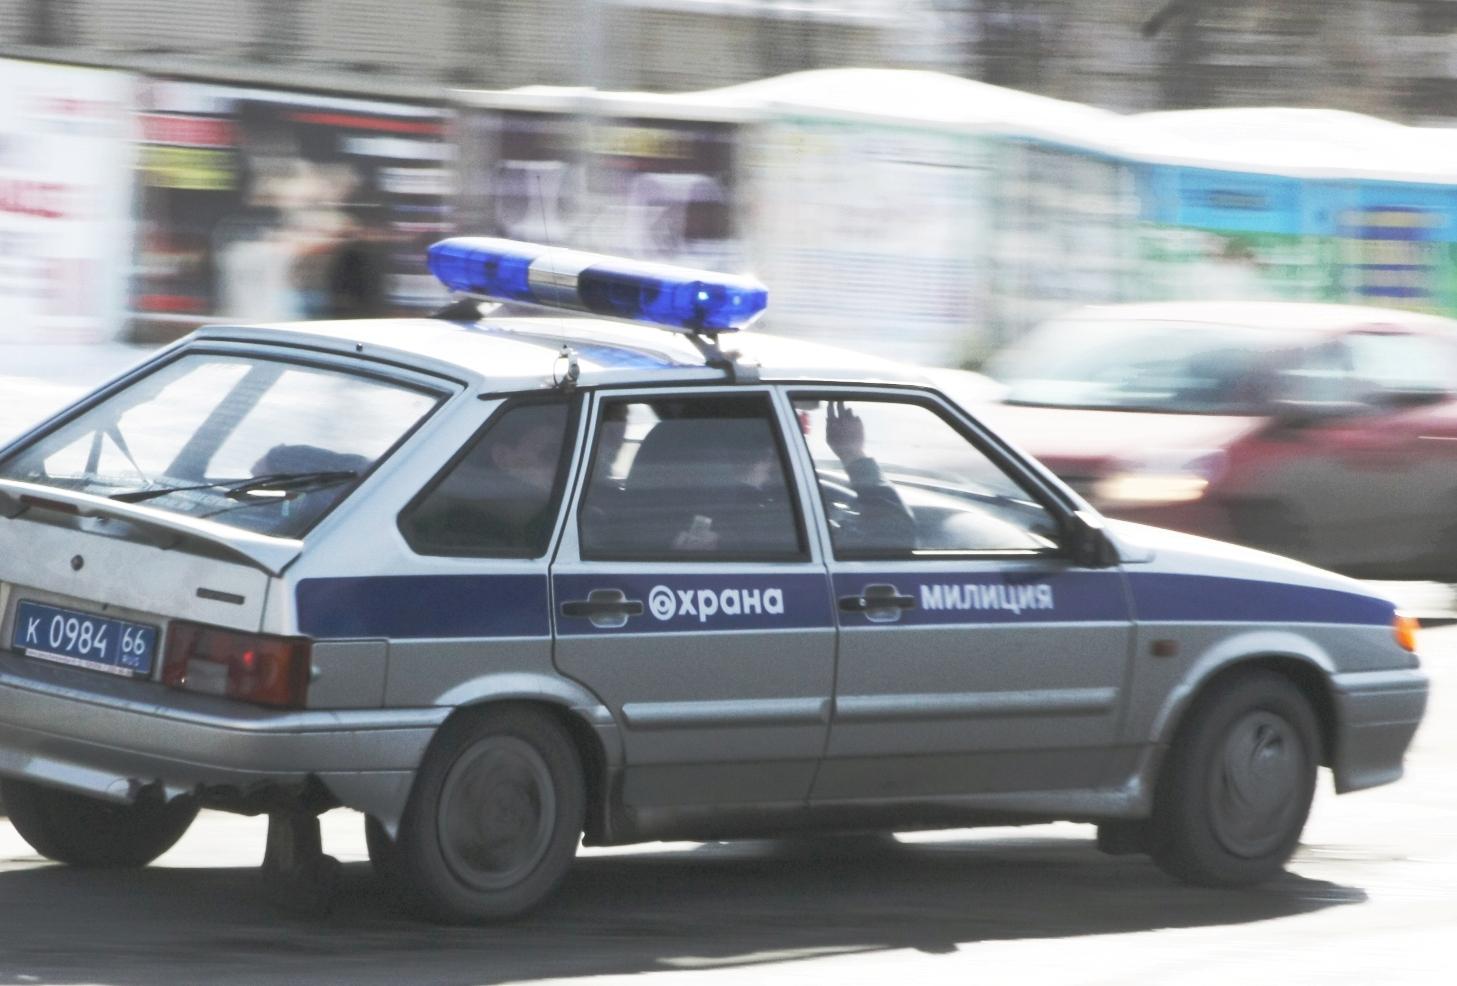 В центре Екатеринбурга средь бела дня похитили девушку